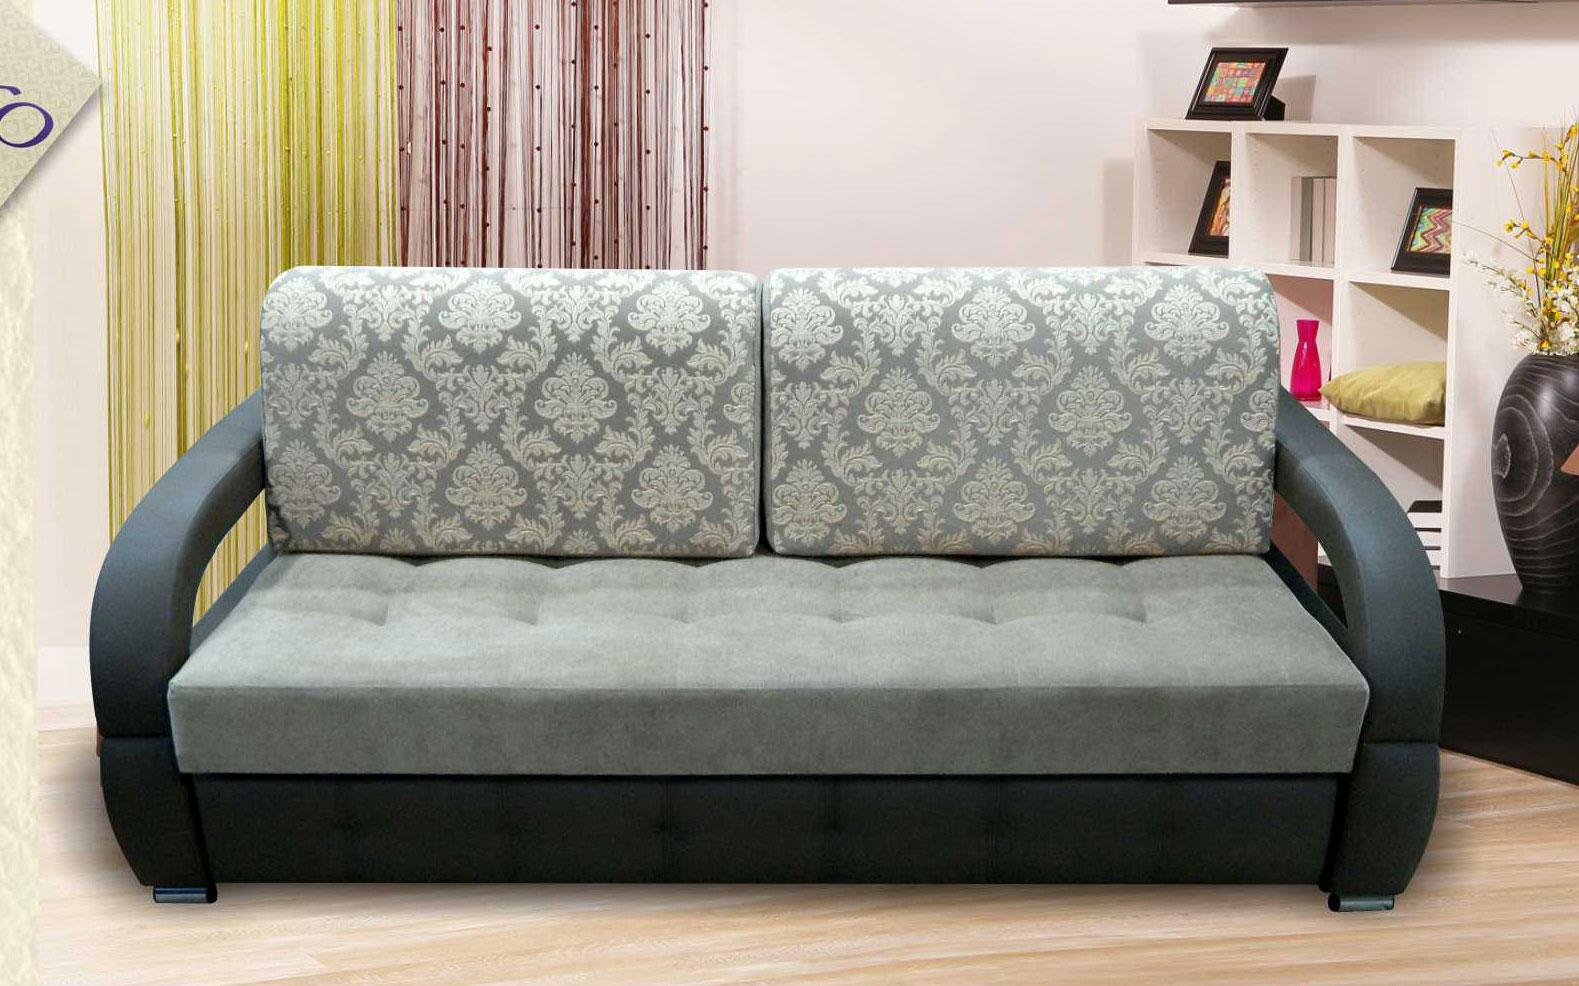 диван с наполнителем ппу фото